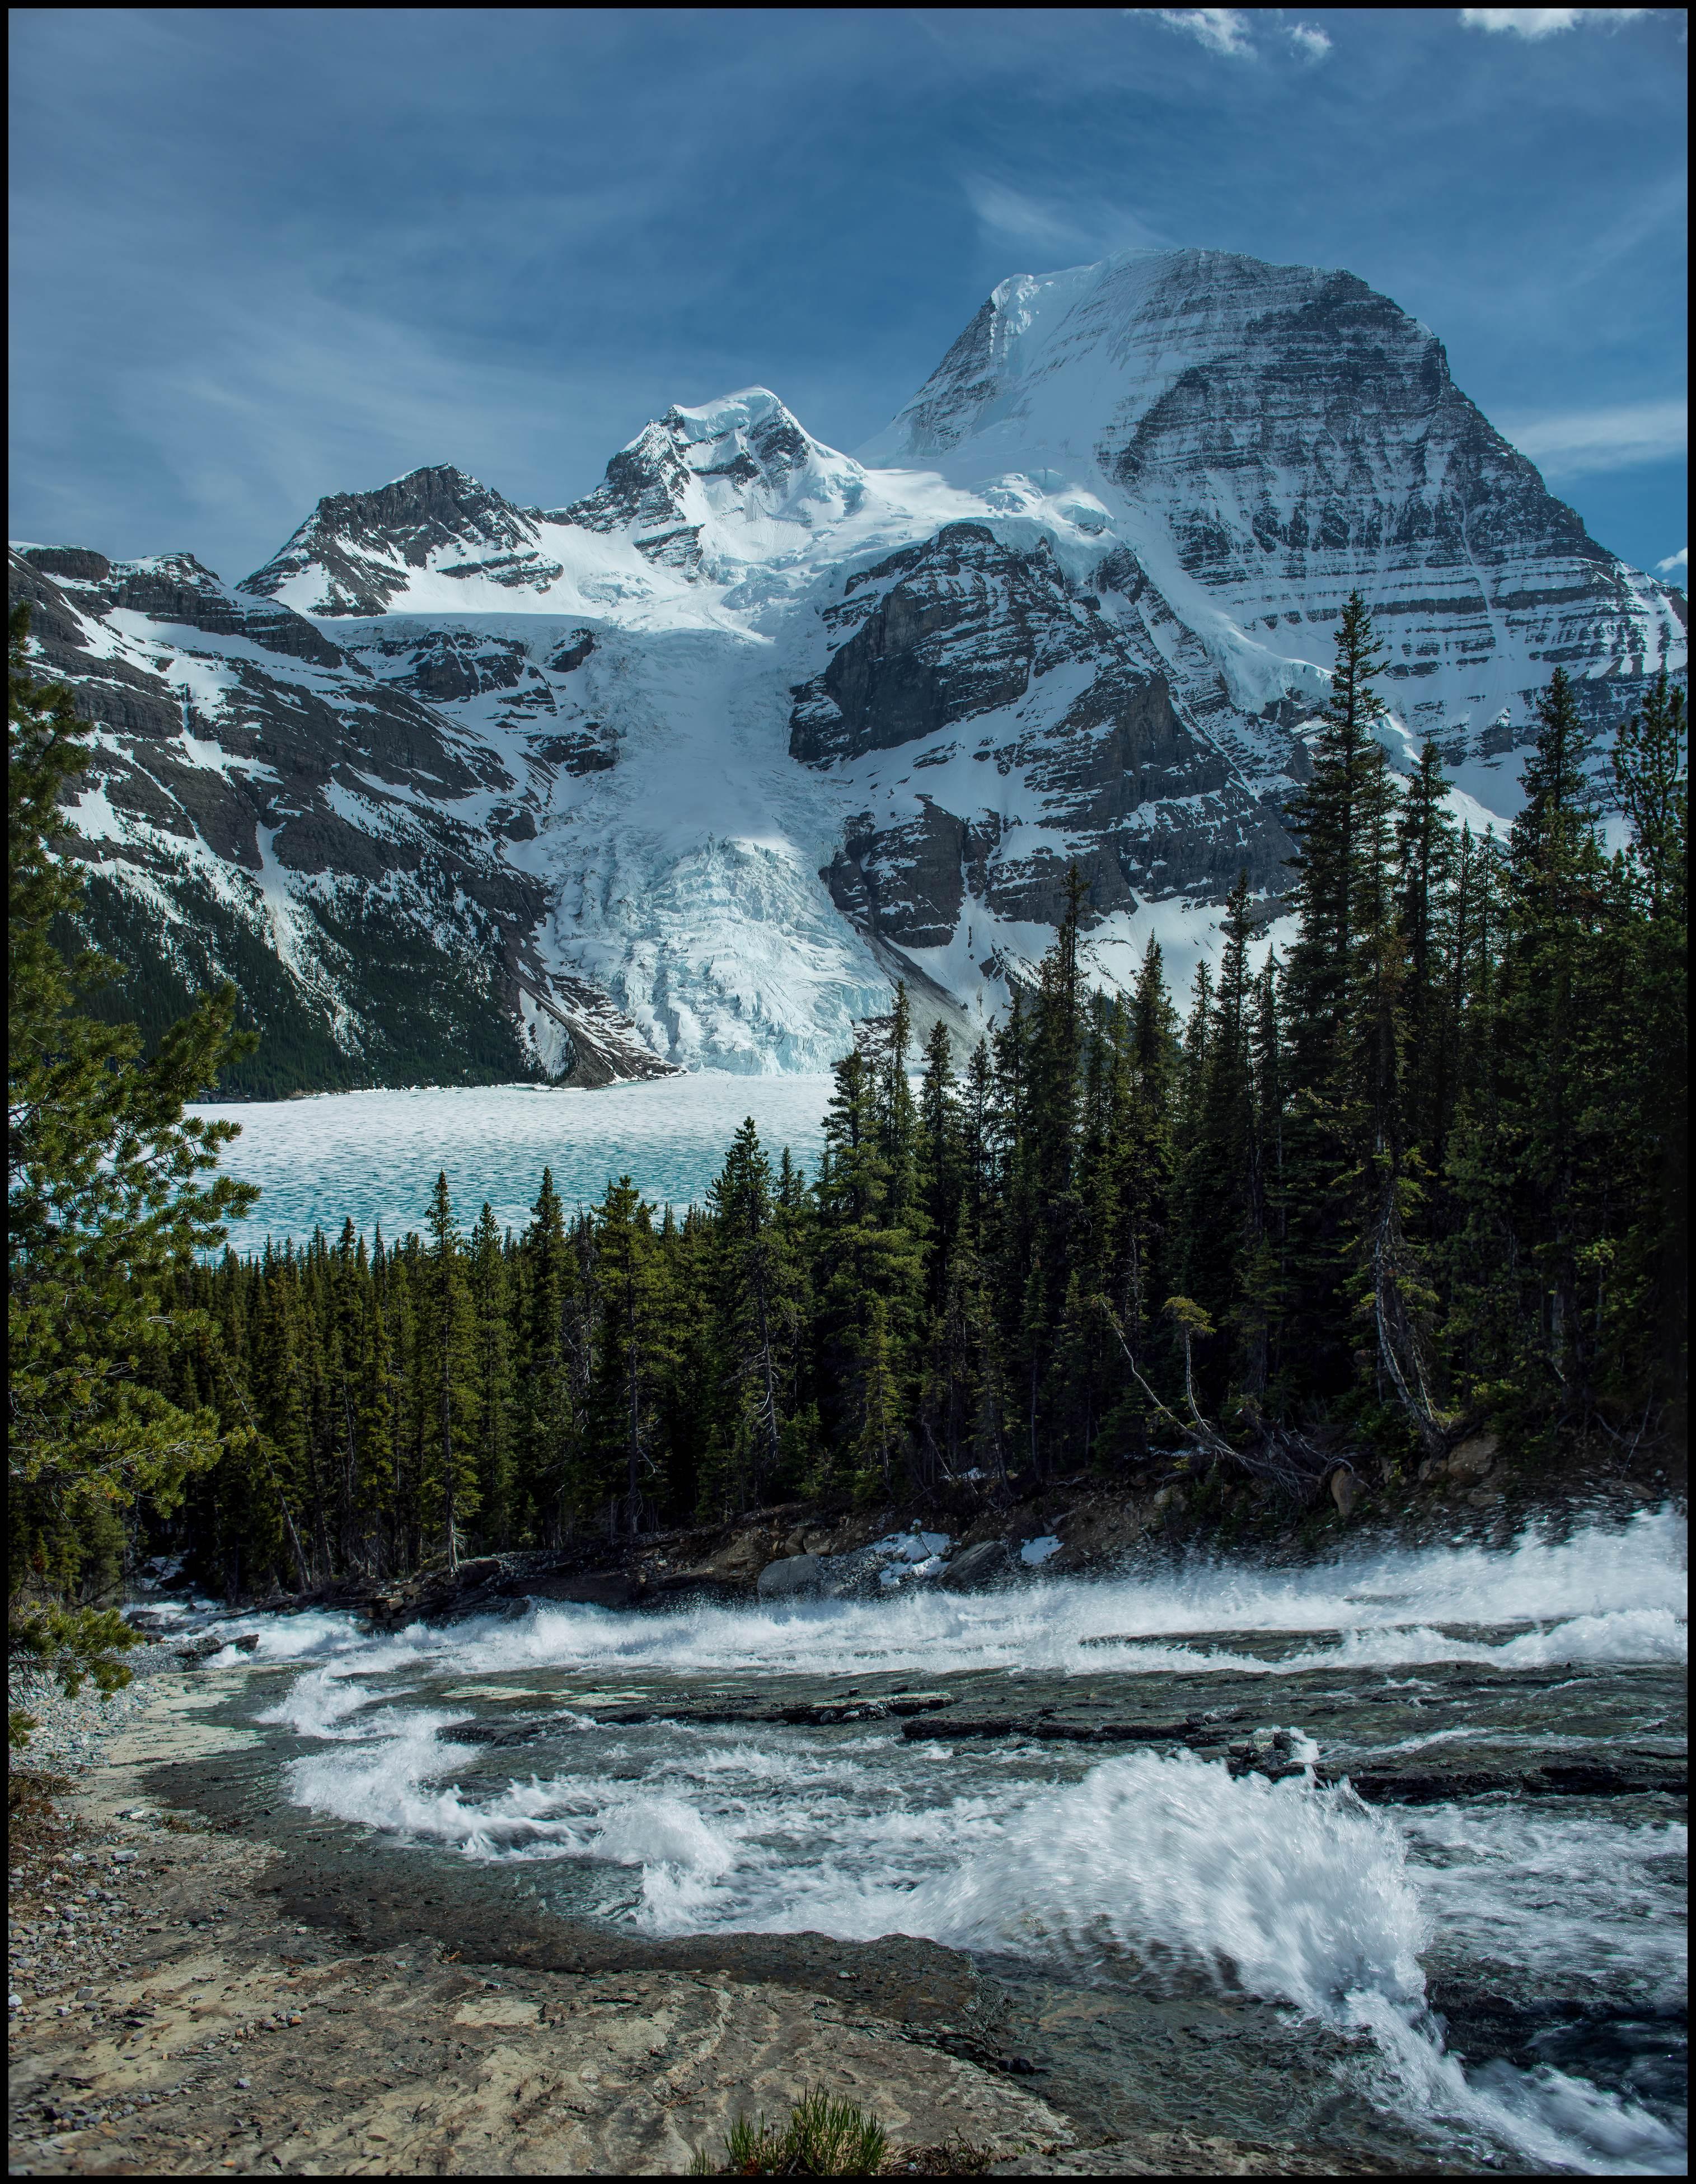 View from halfway up at Toboggan Falls, Berg Lake Sony A7 / Canon FD Tilt Shift 35 2.8